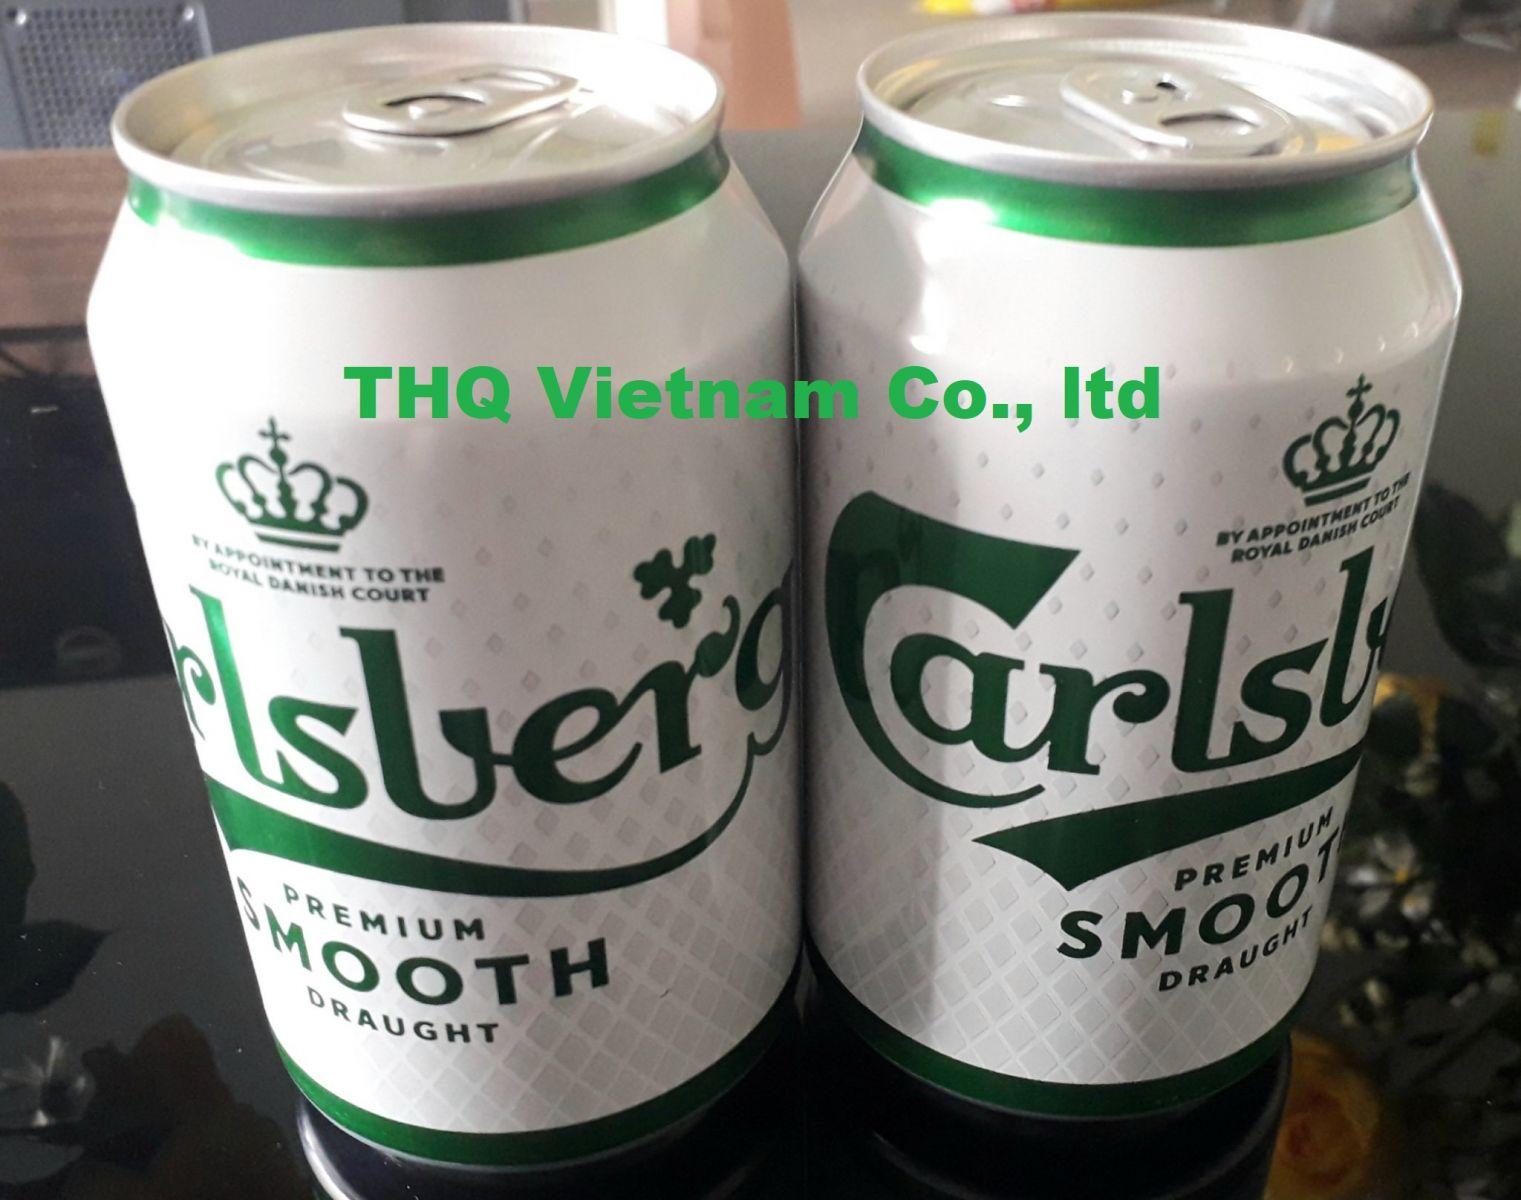 [THQ VIETNAM] Carlsberg beer 330ml x 24 cans